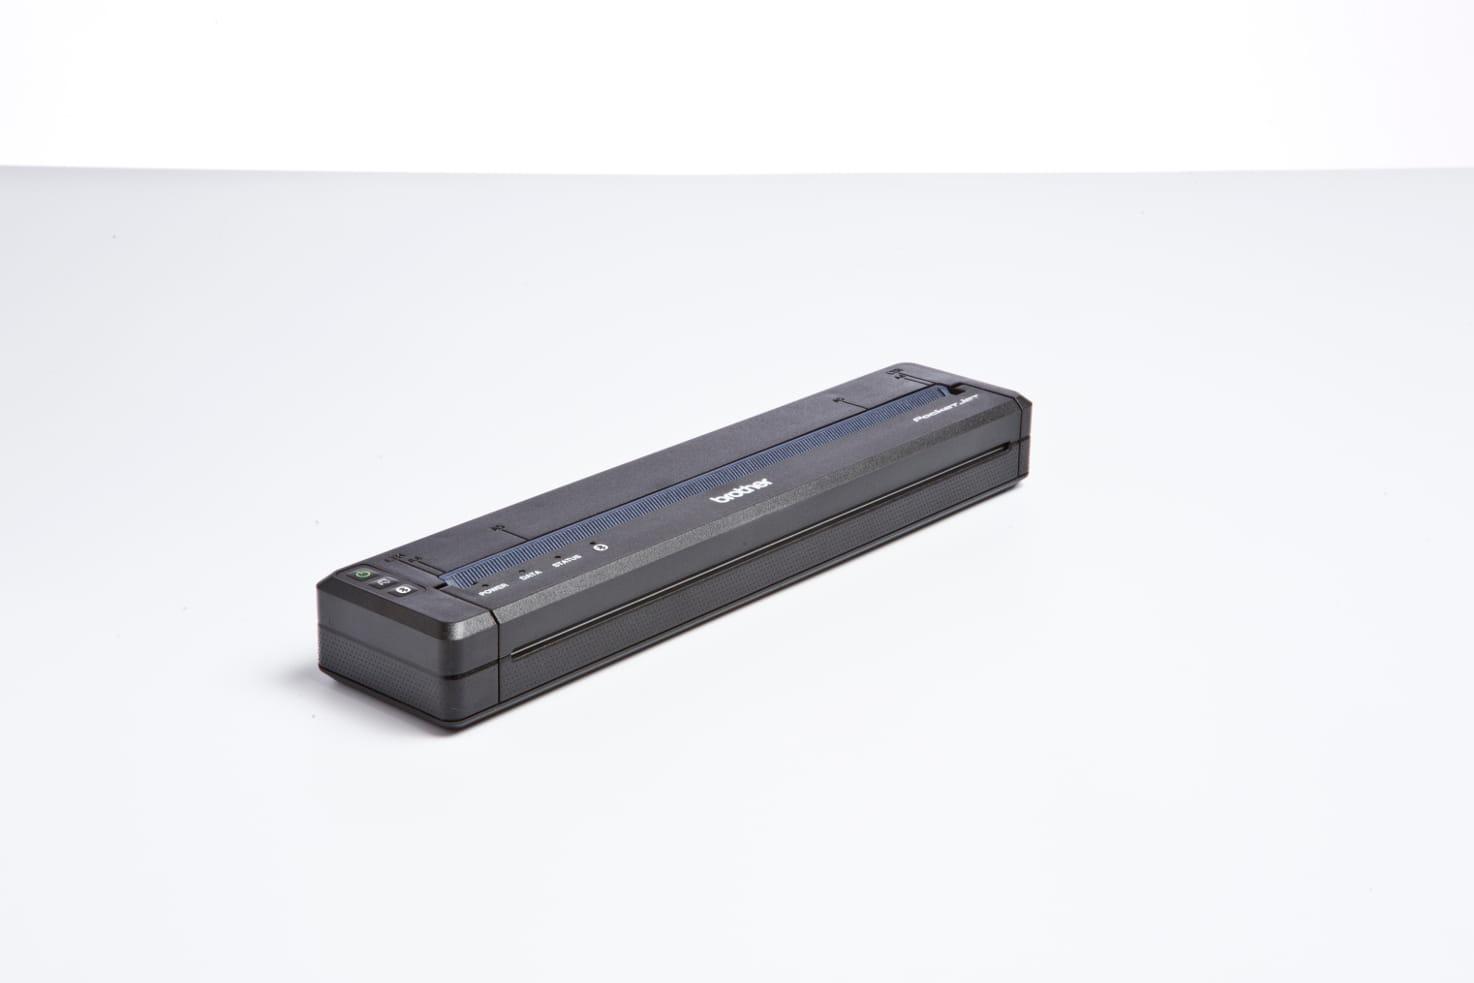 Impressora portátil PJ-763